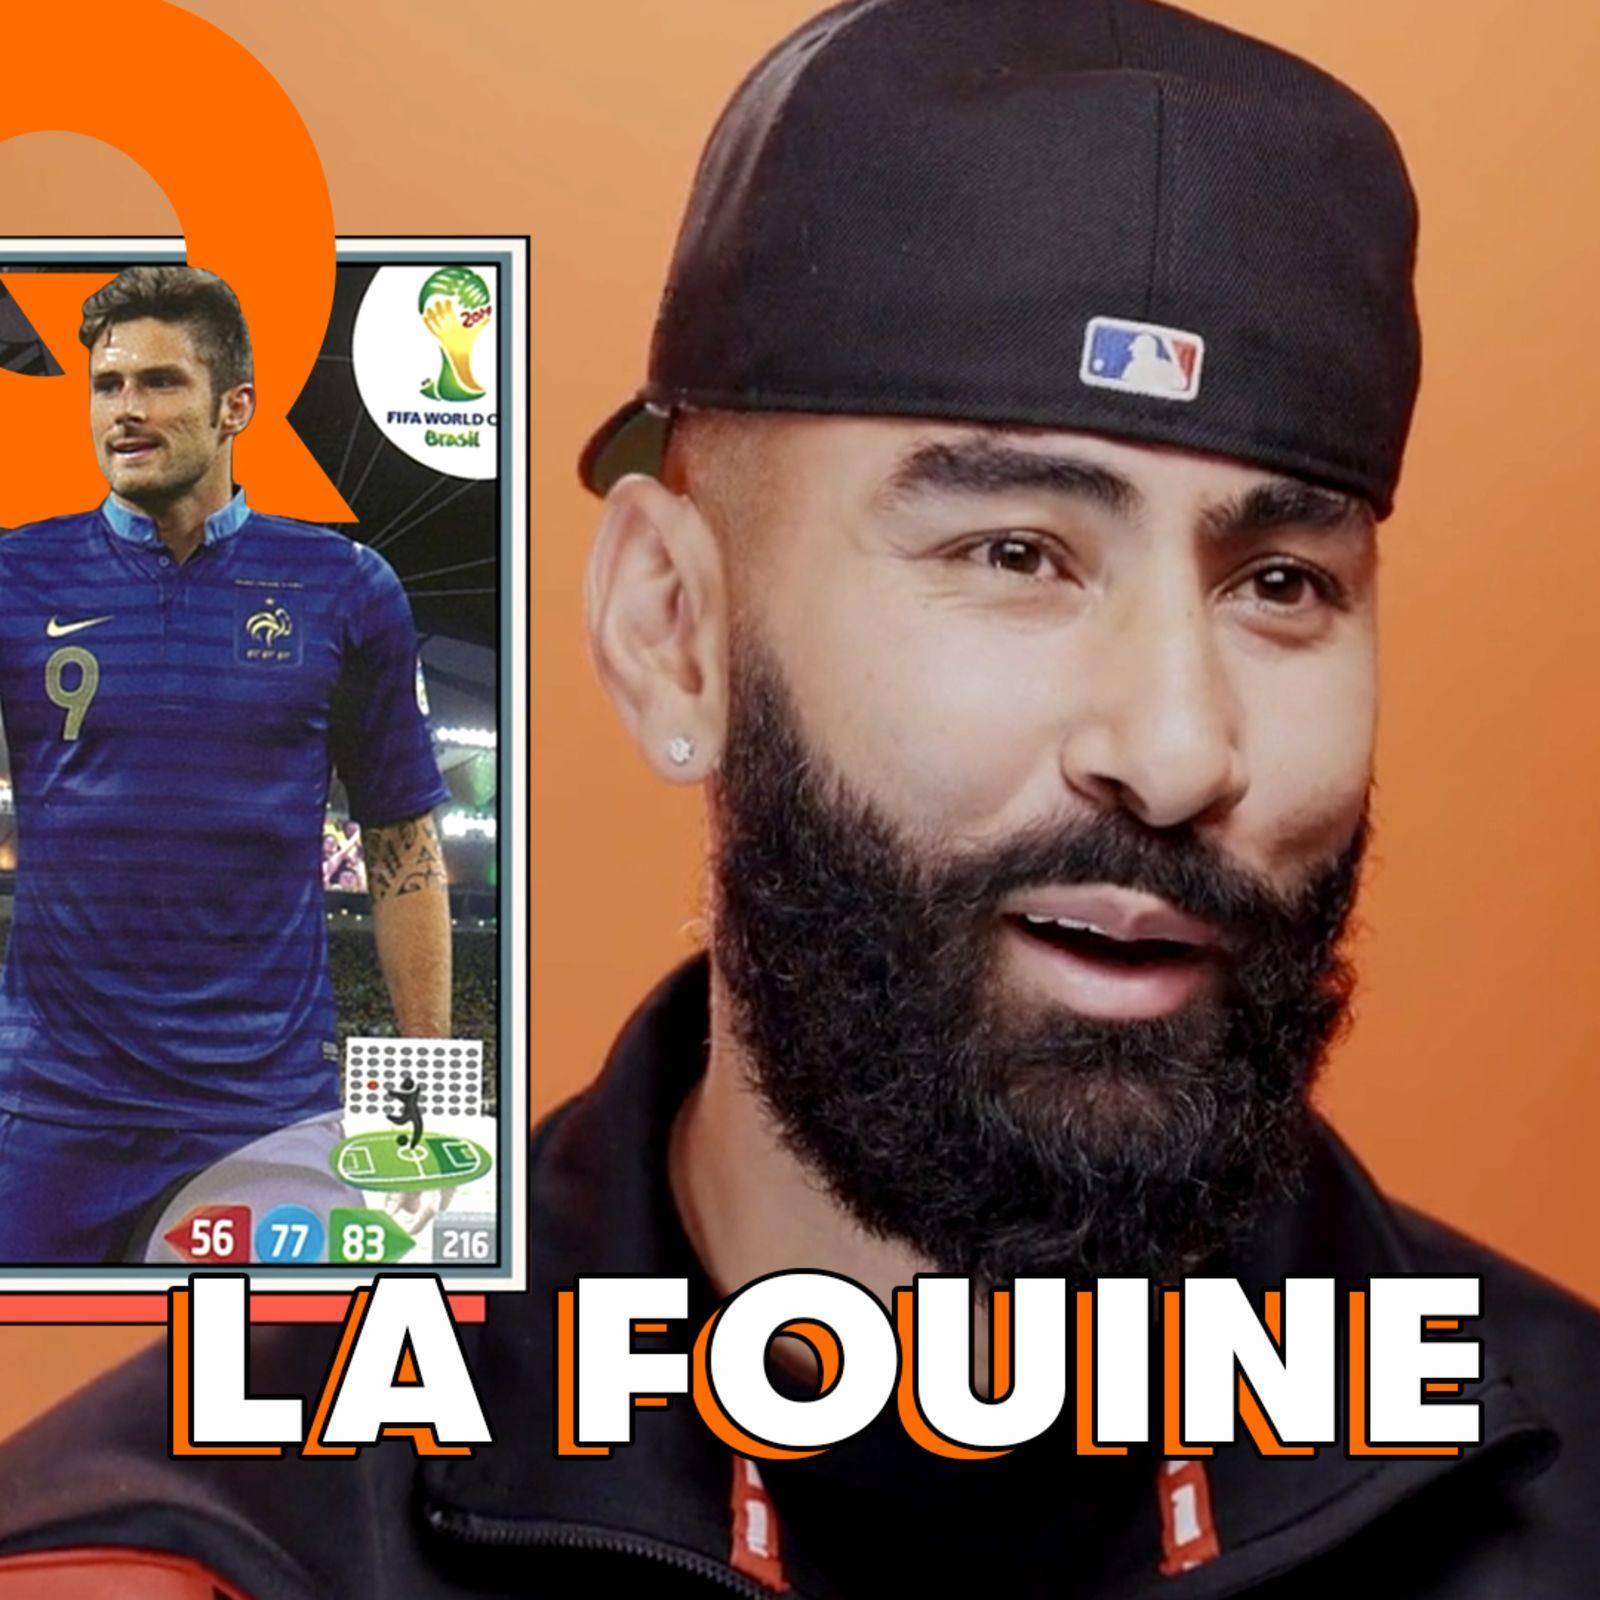 La Tier List football de La Fouine : Messi, Benzema, Ronaldinho